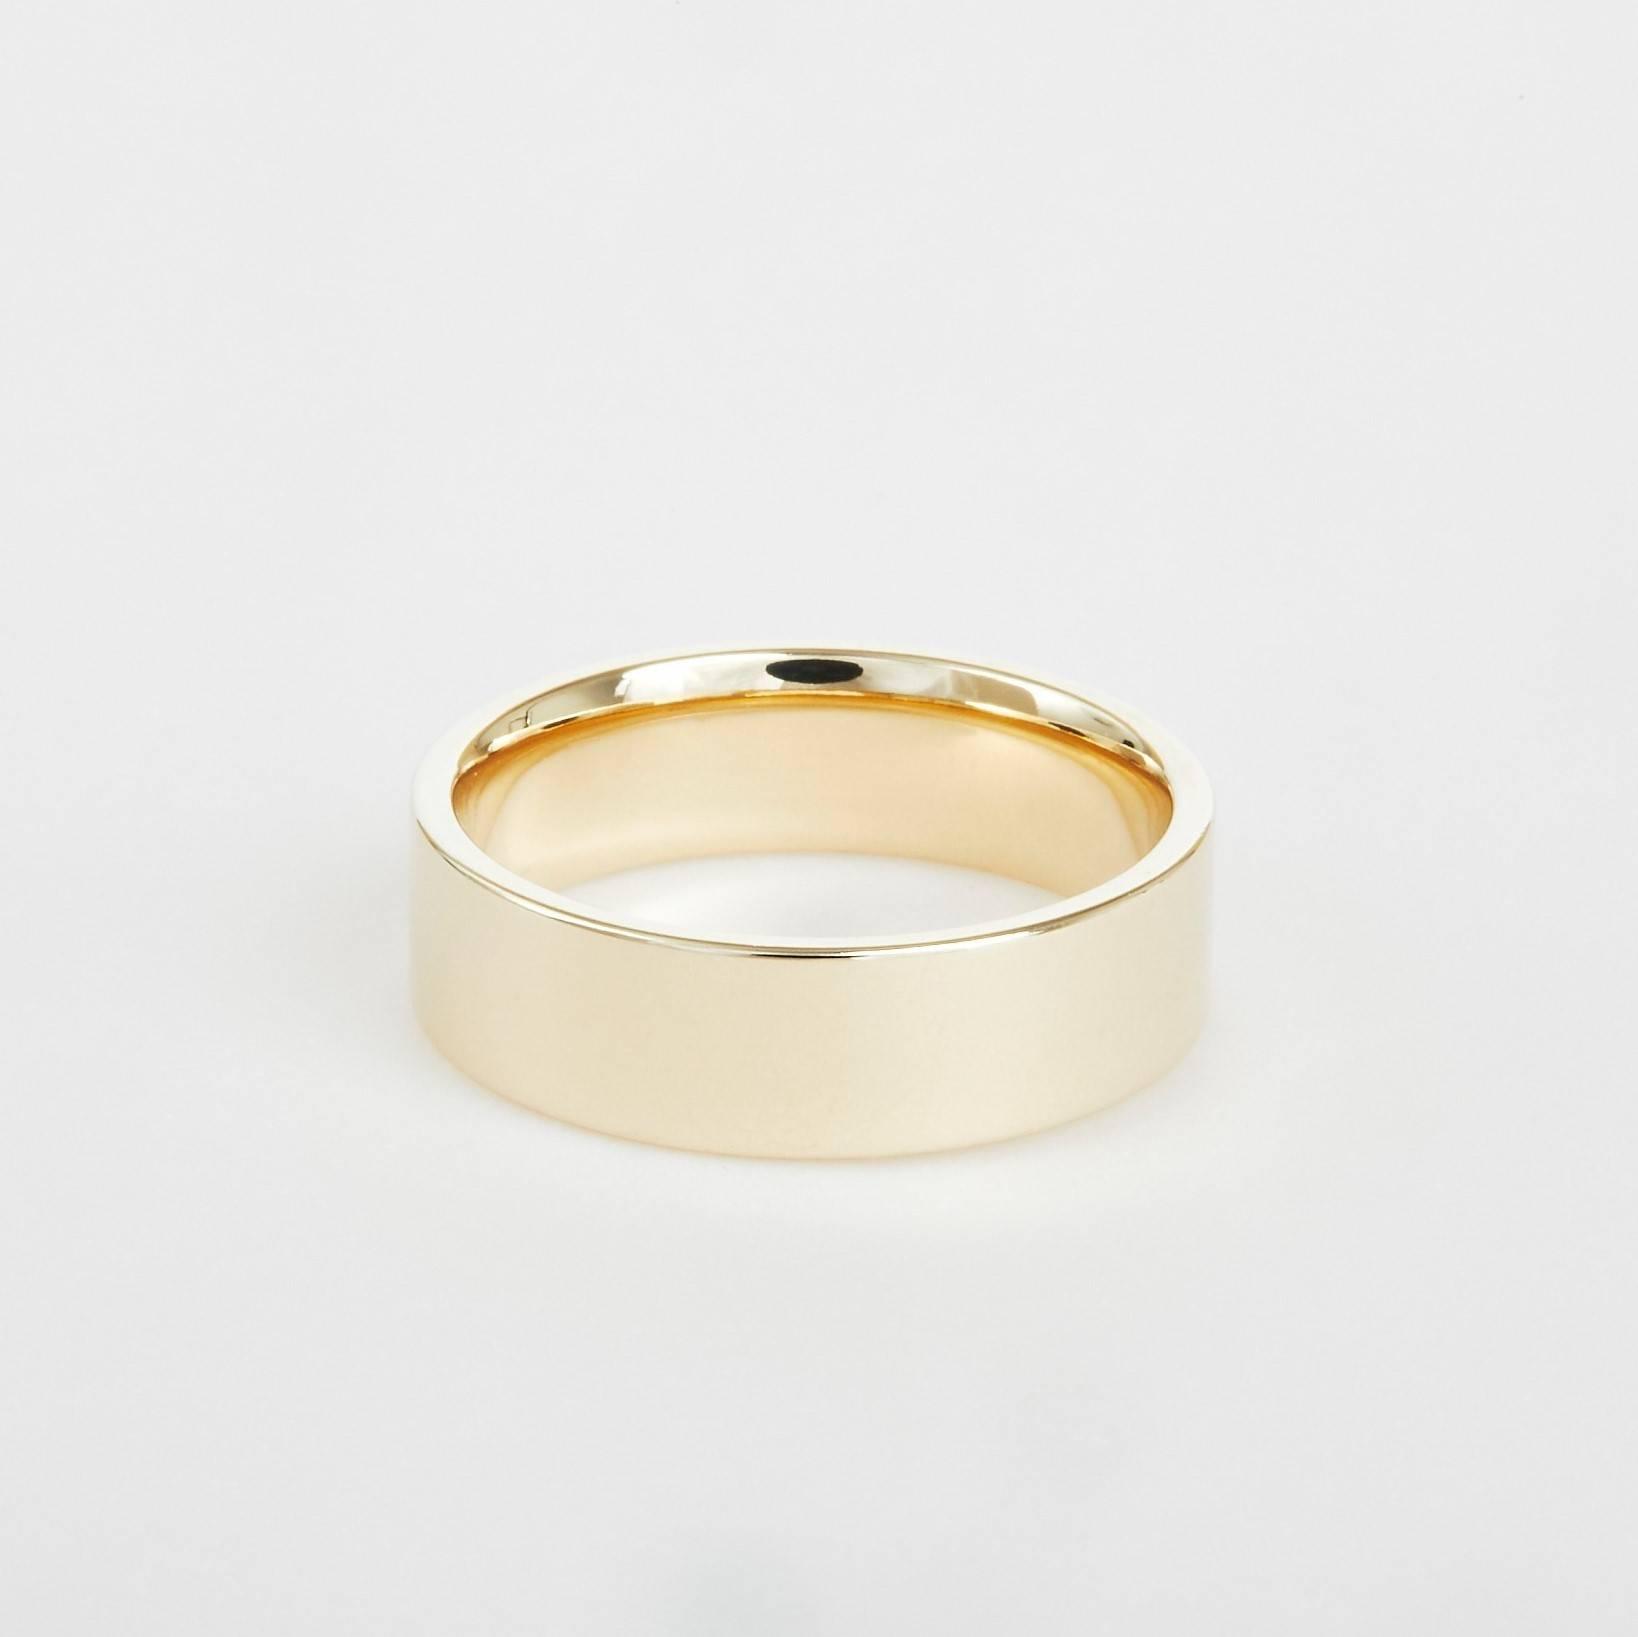 flat yellow gold wedding band